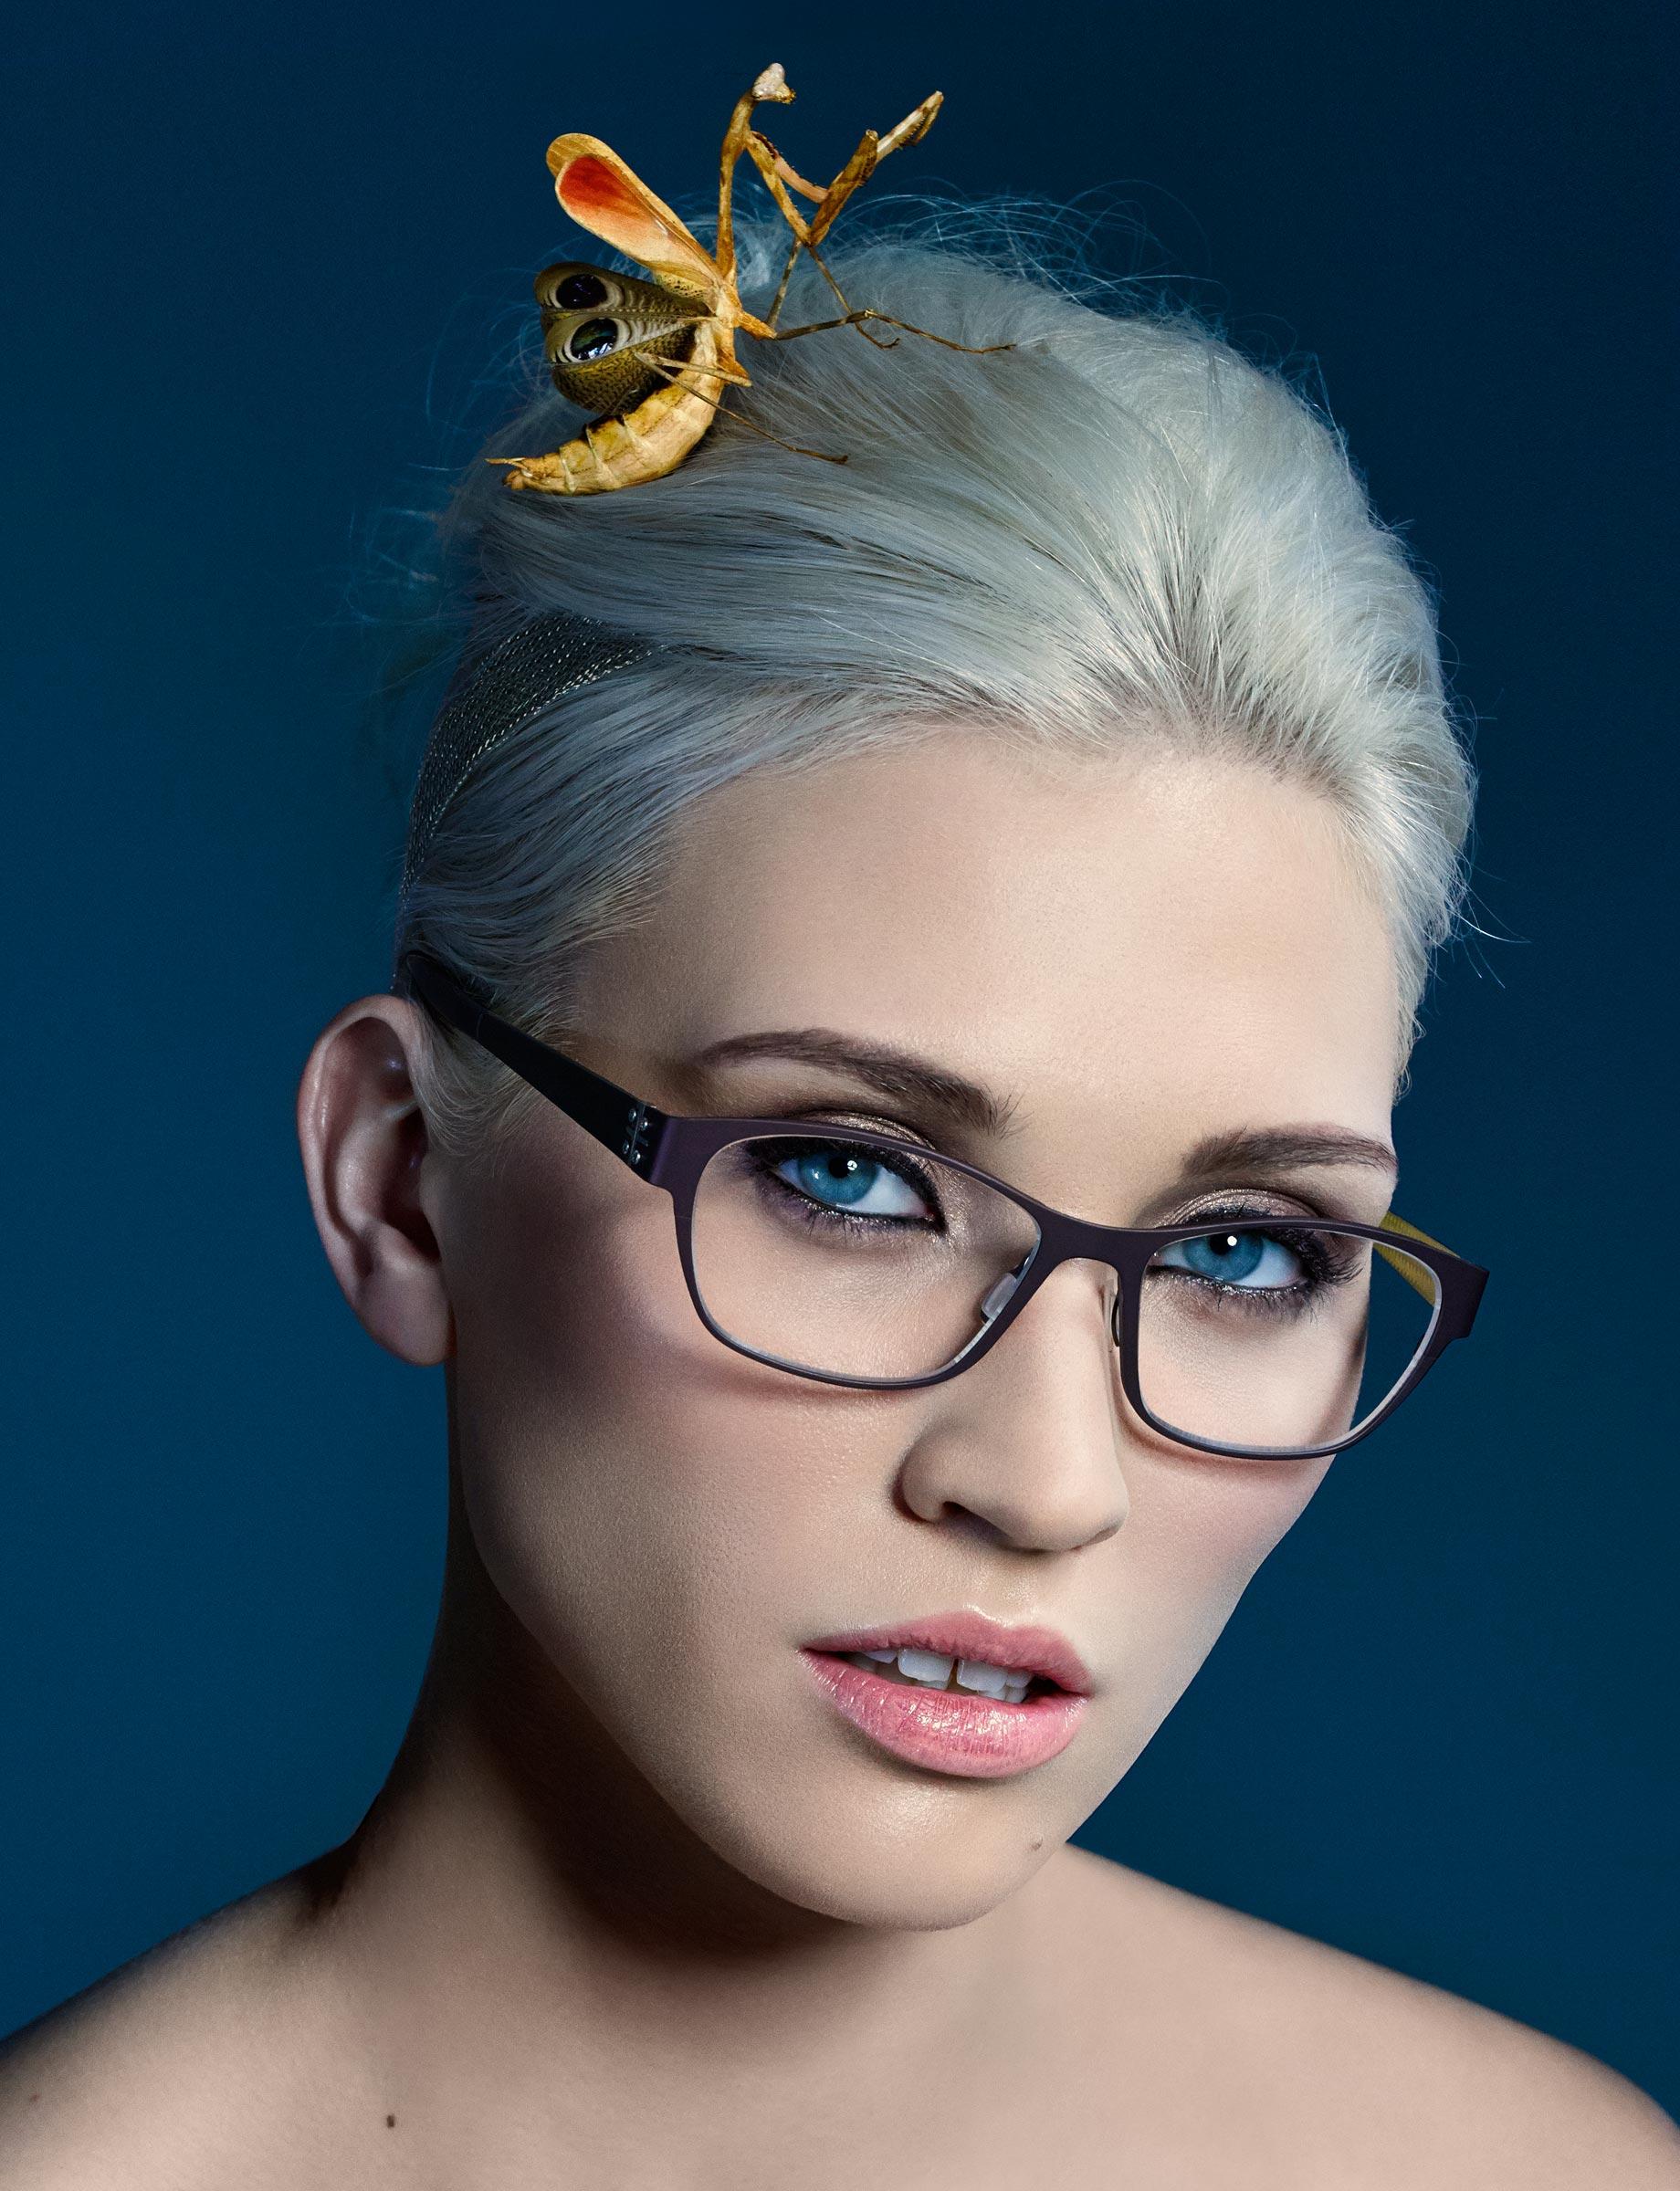 219_Eyewear_Joseph_Ford_Mantis_319_crop.jpg